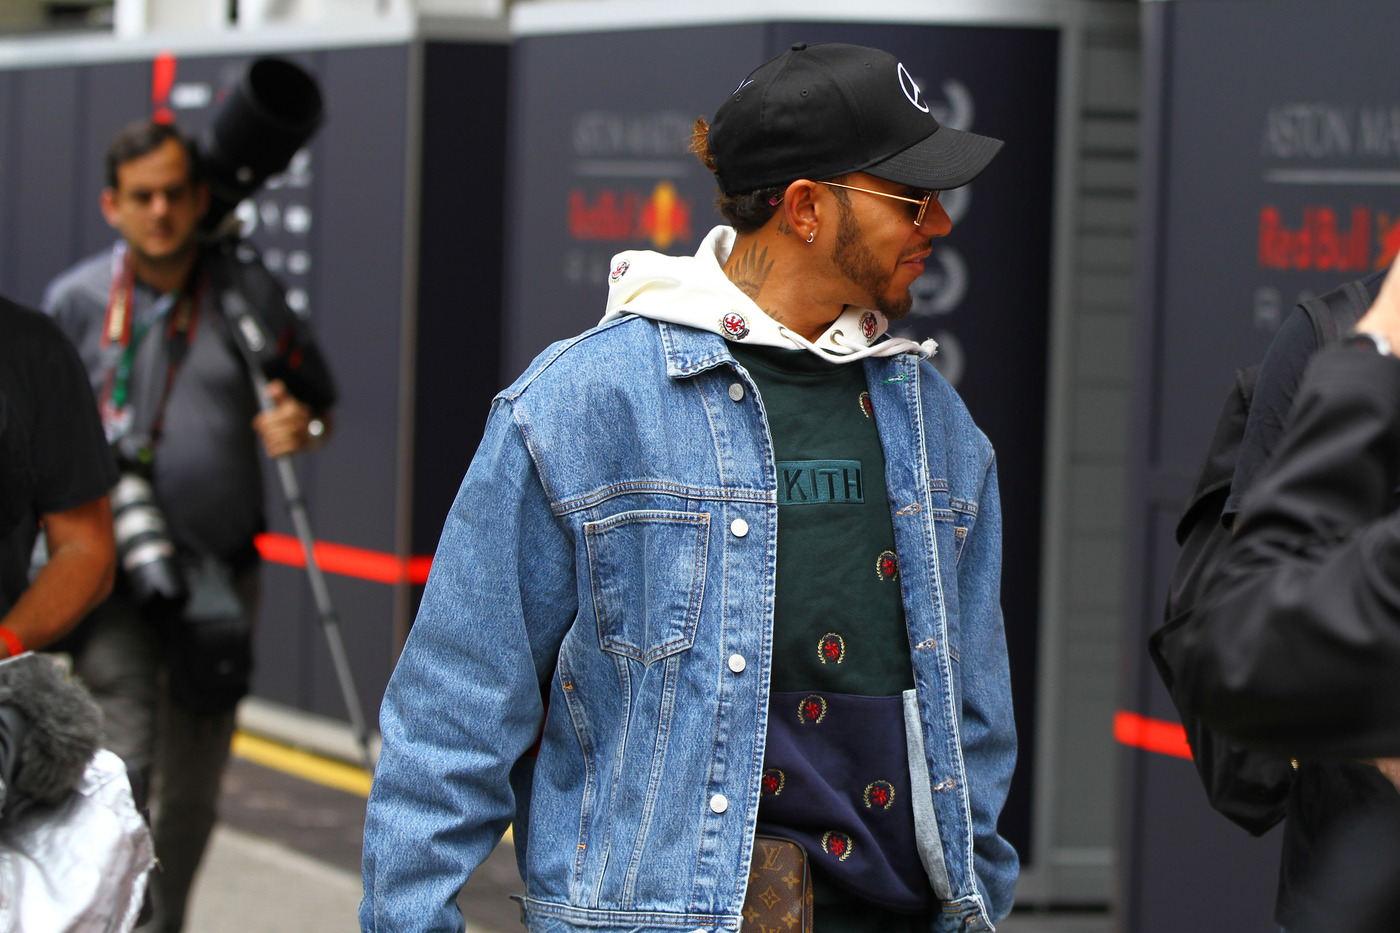 F1, GP Brasile: Hamilton in pole, ma è polemica